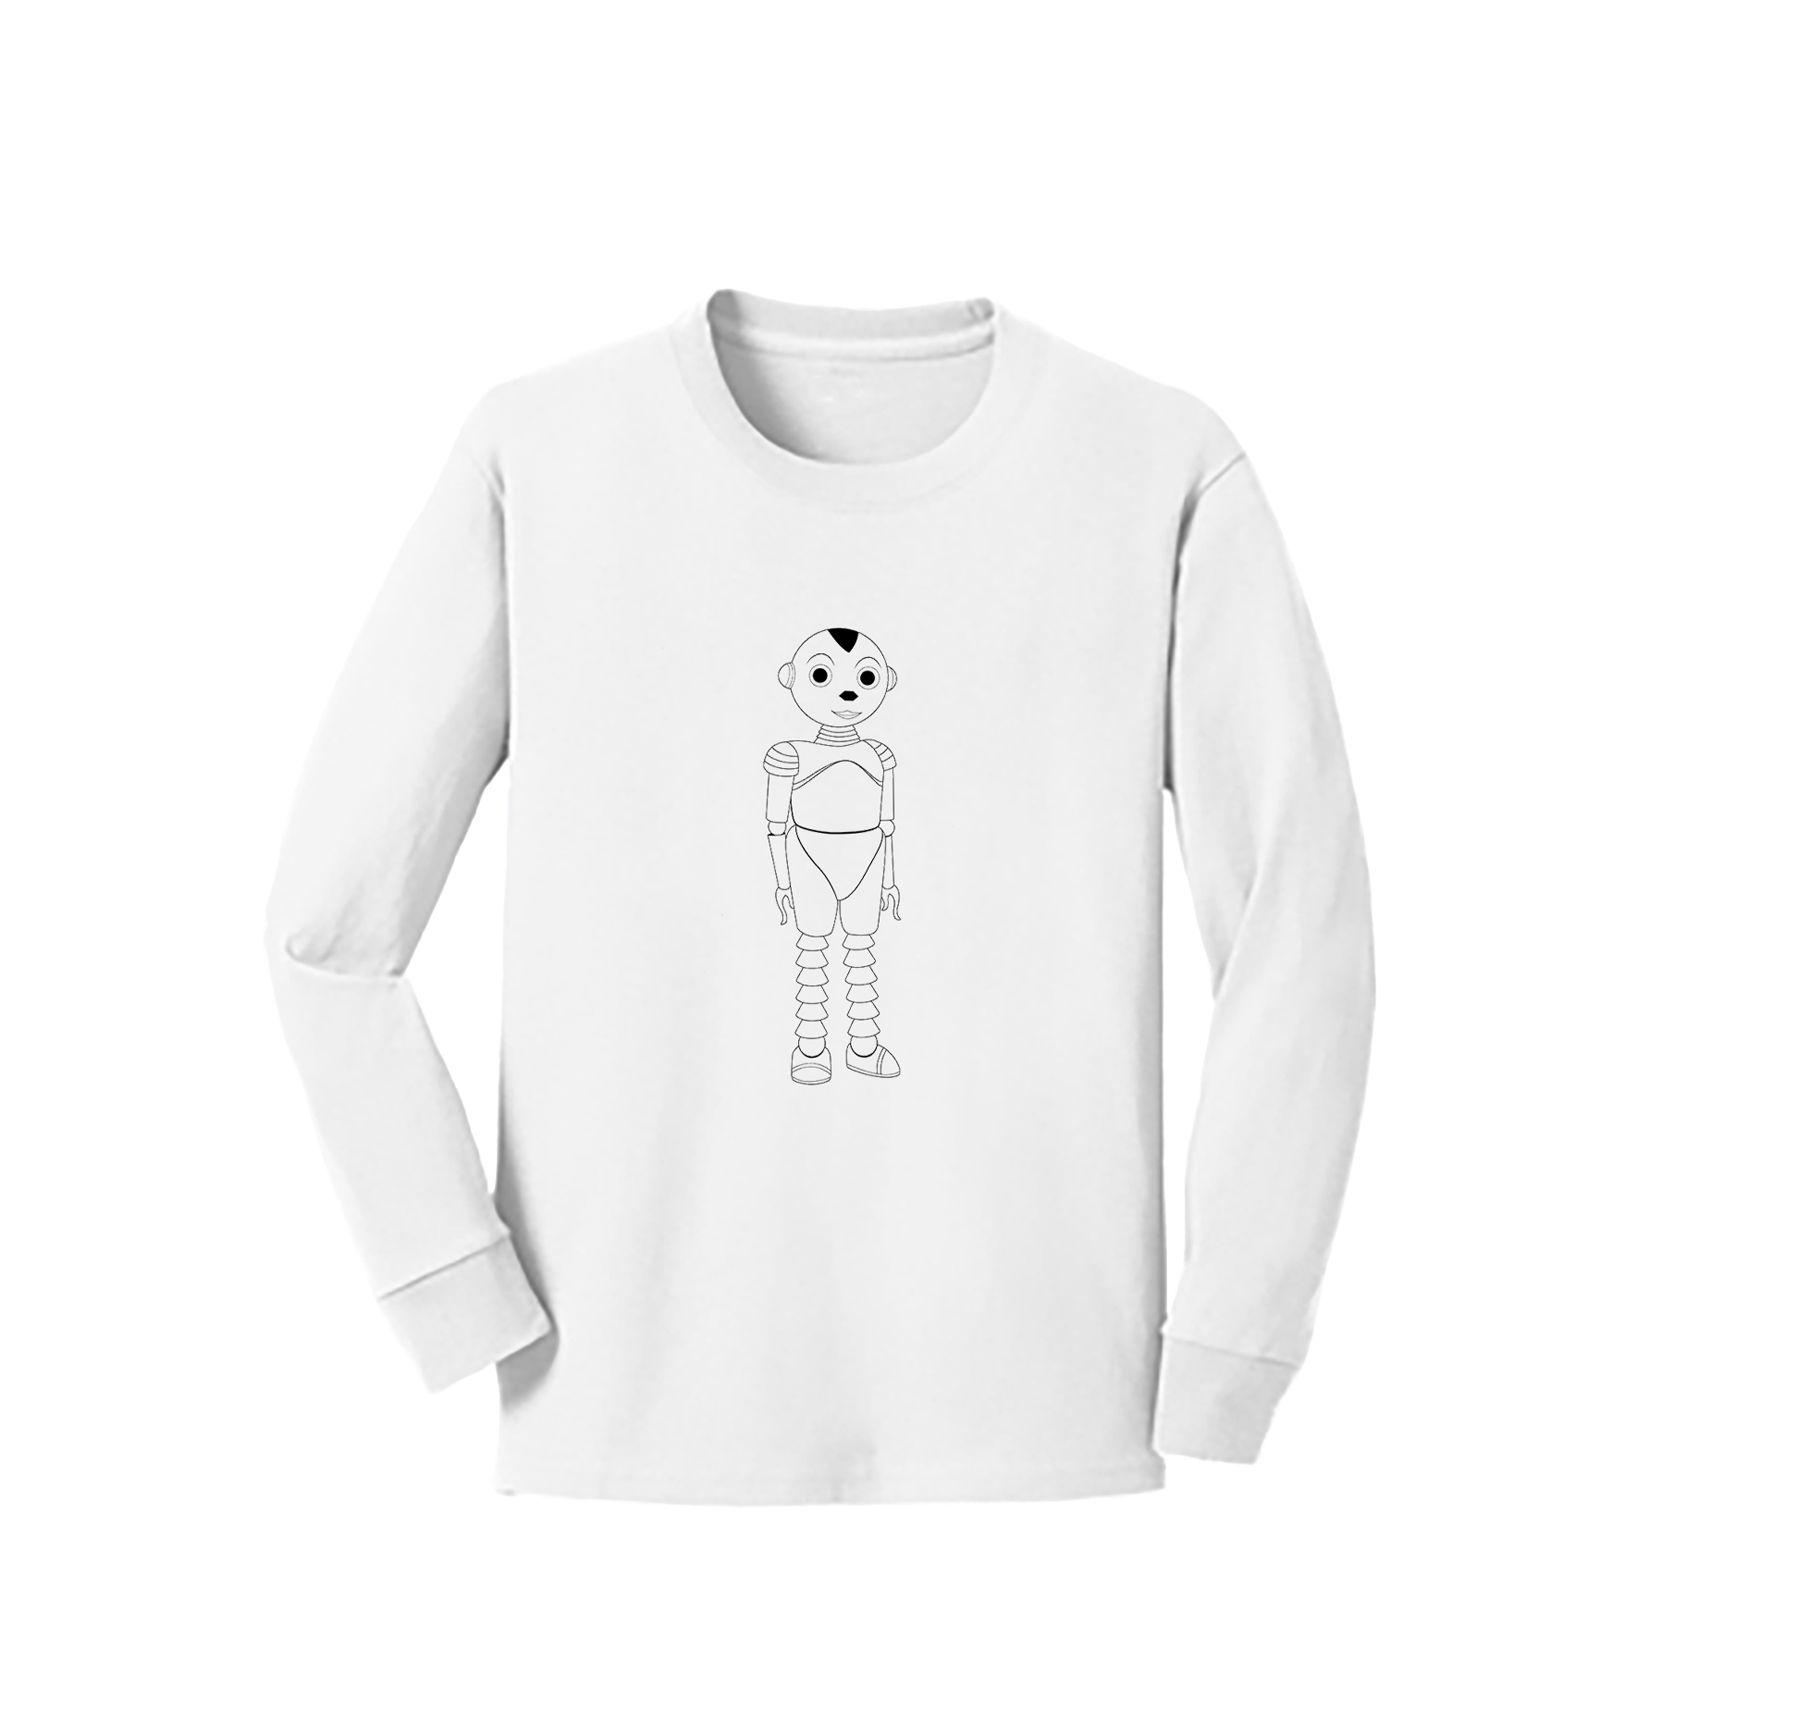 Talee Long Sleeve Coloring T-Shirt | Tshirt colors, Shirts ...